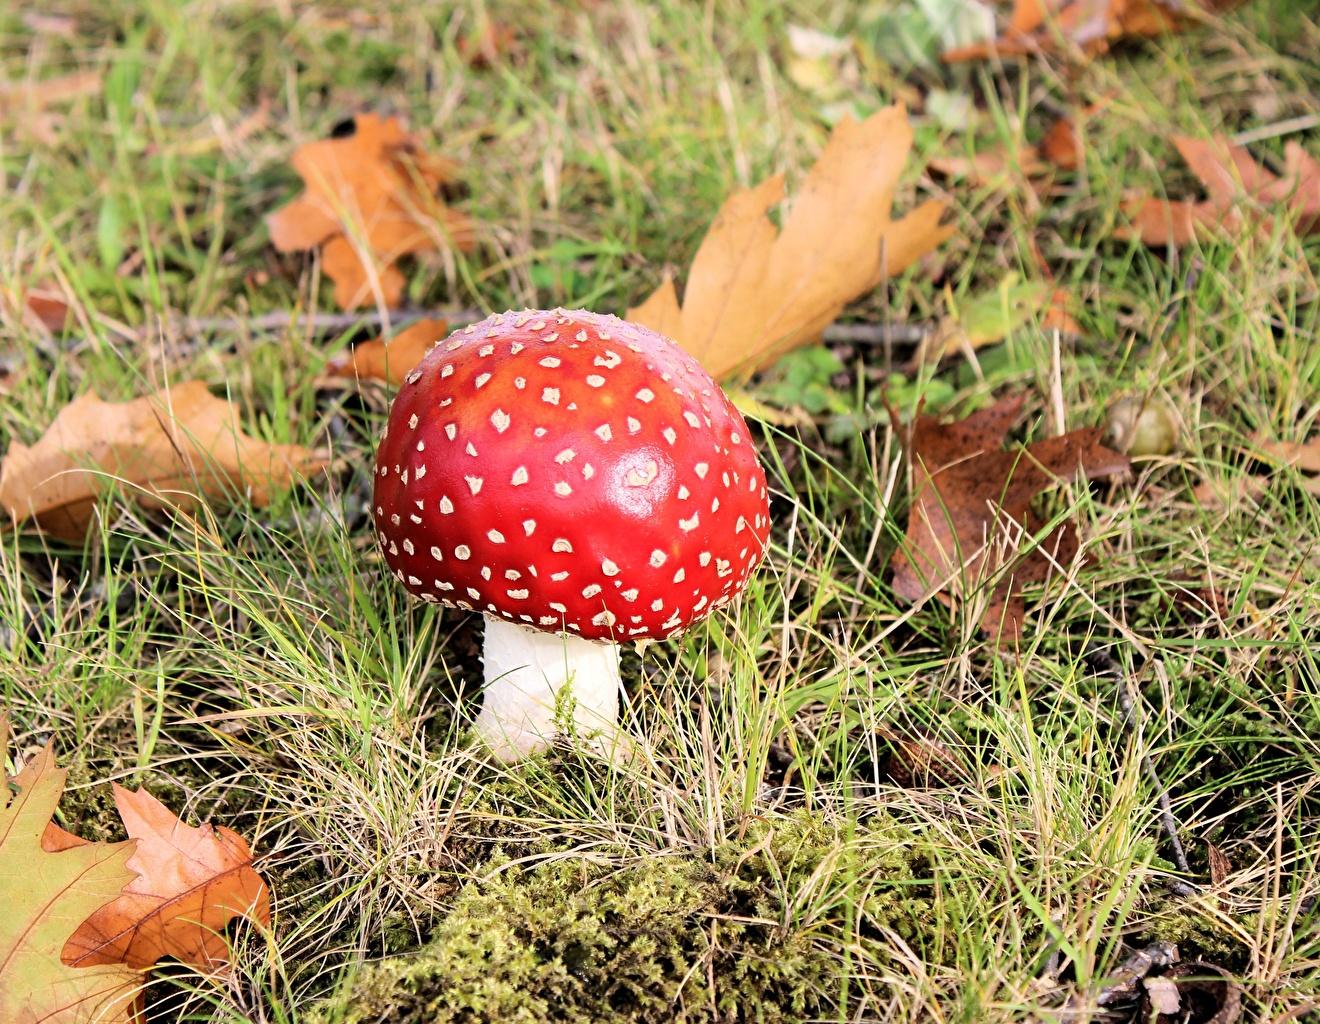 Foto Rot Natur Wulstlinge Gras Pilze Natur